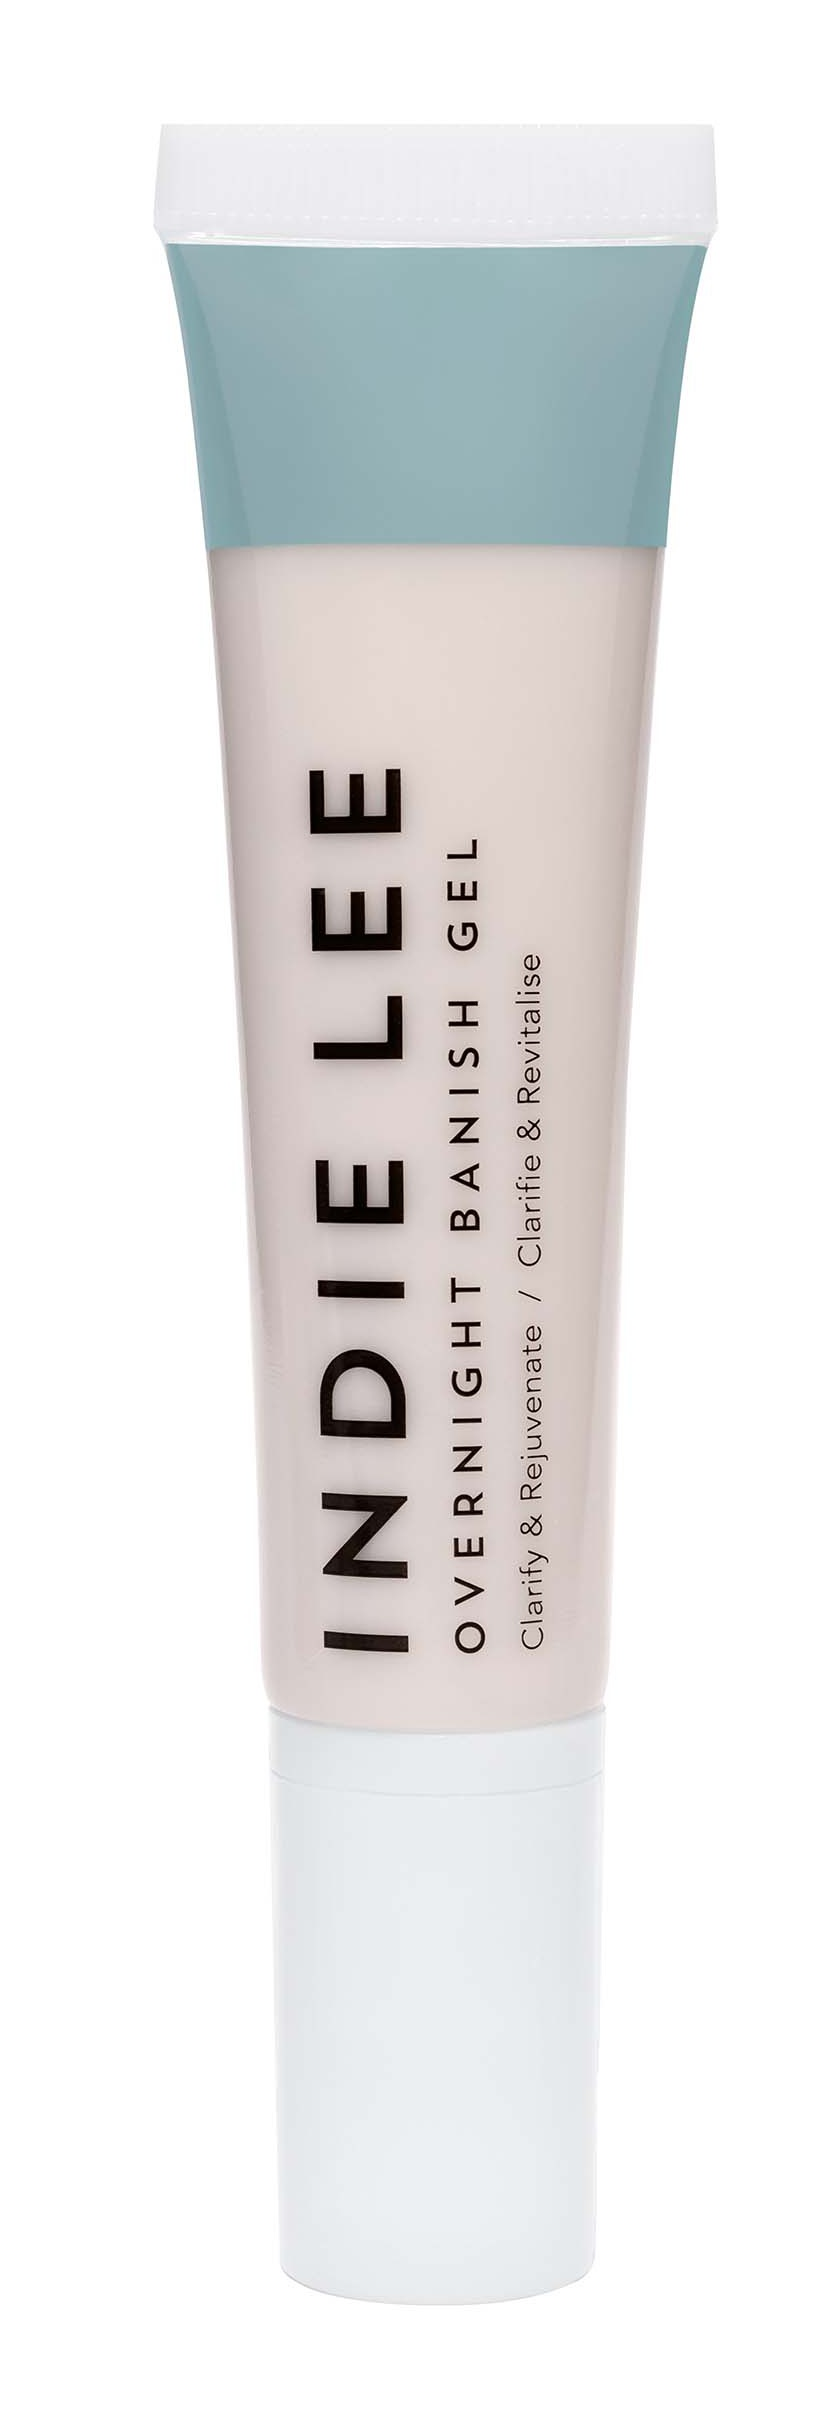 Indie Lee Overnight Banish Gel